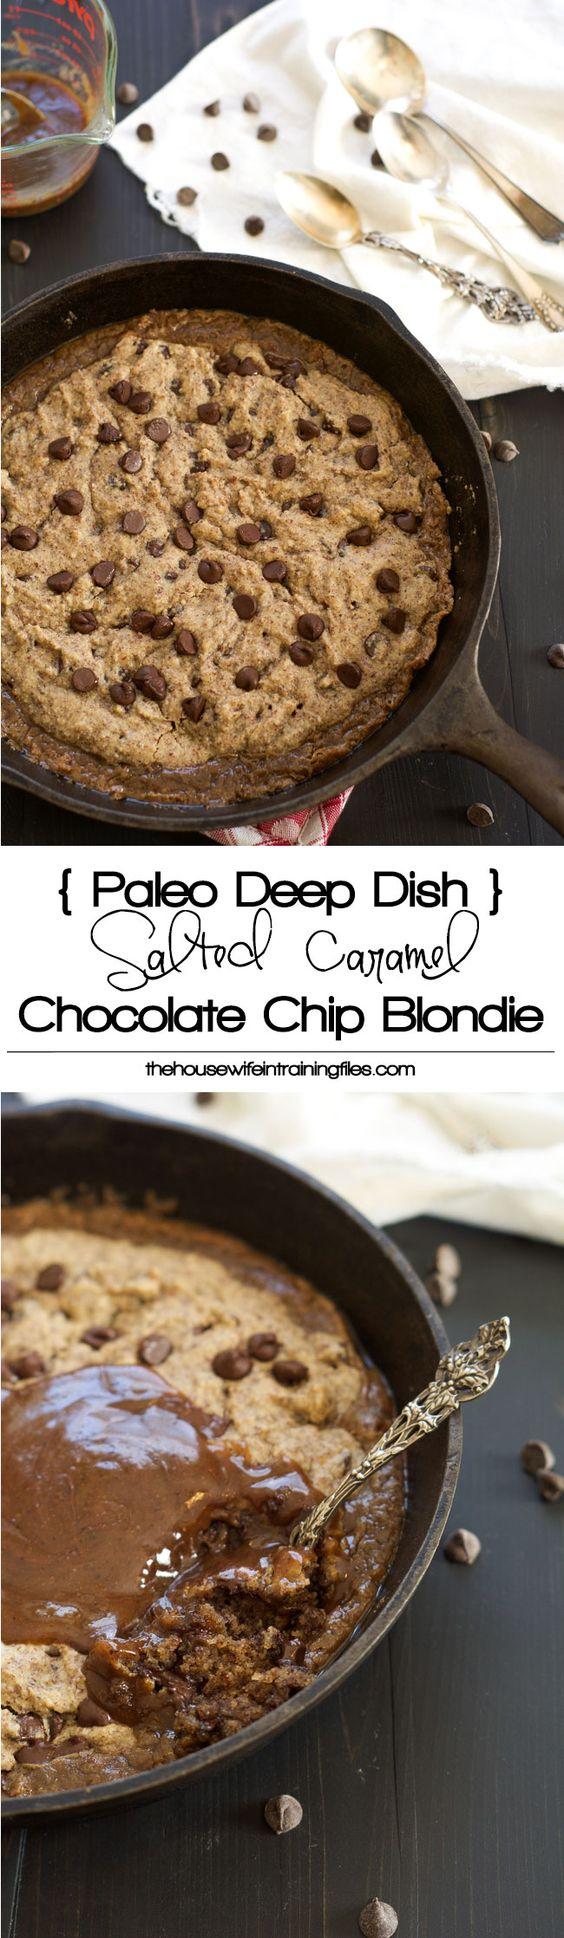 Salted Caramel Chocolate Chip Blondies